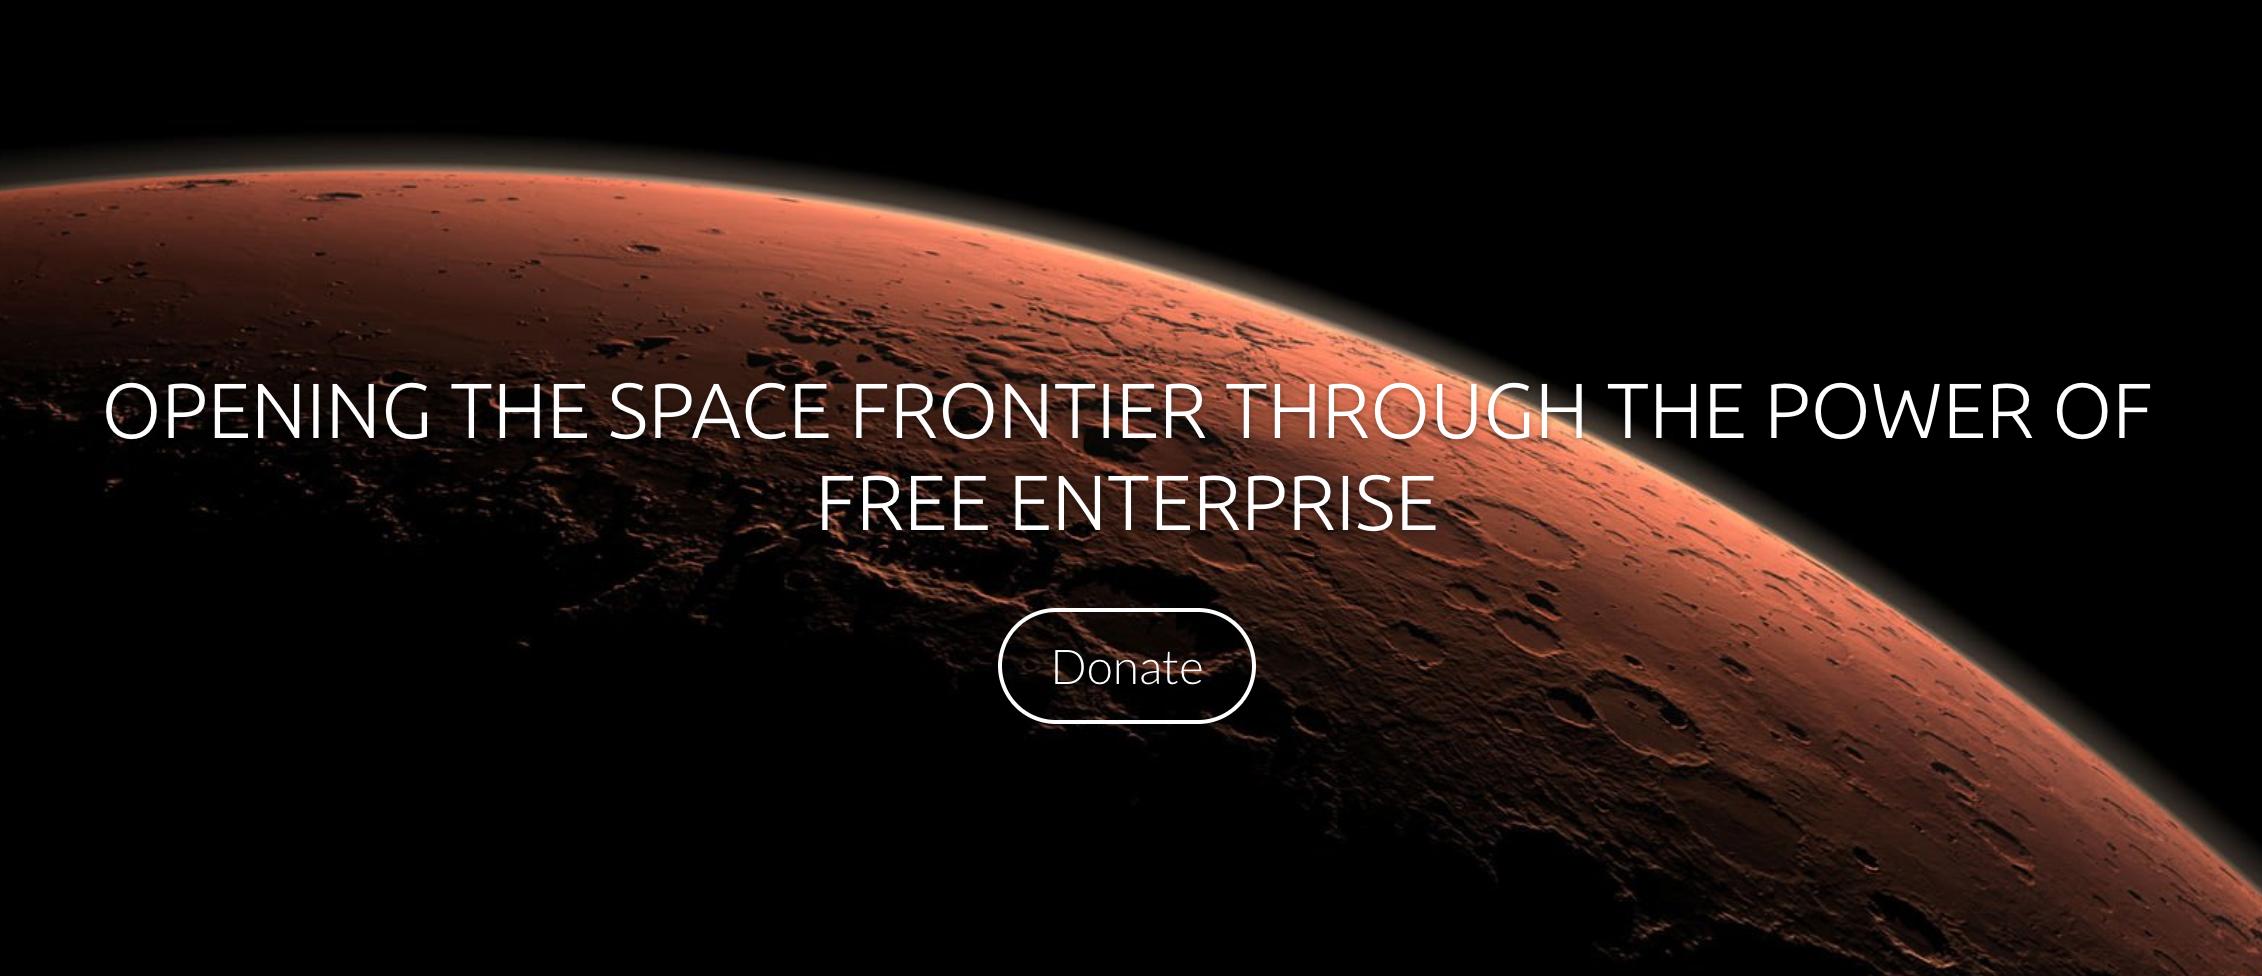 Safe Frontier Foundation mission